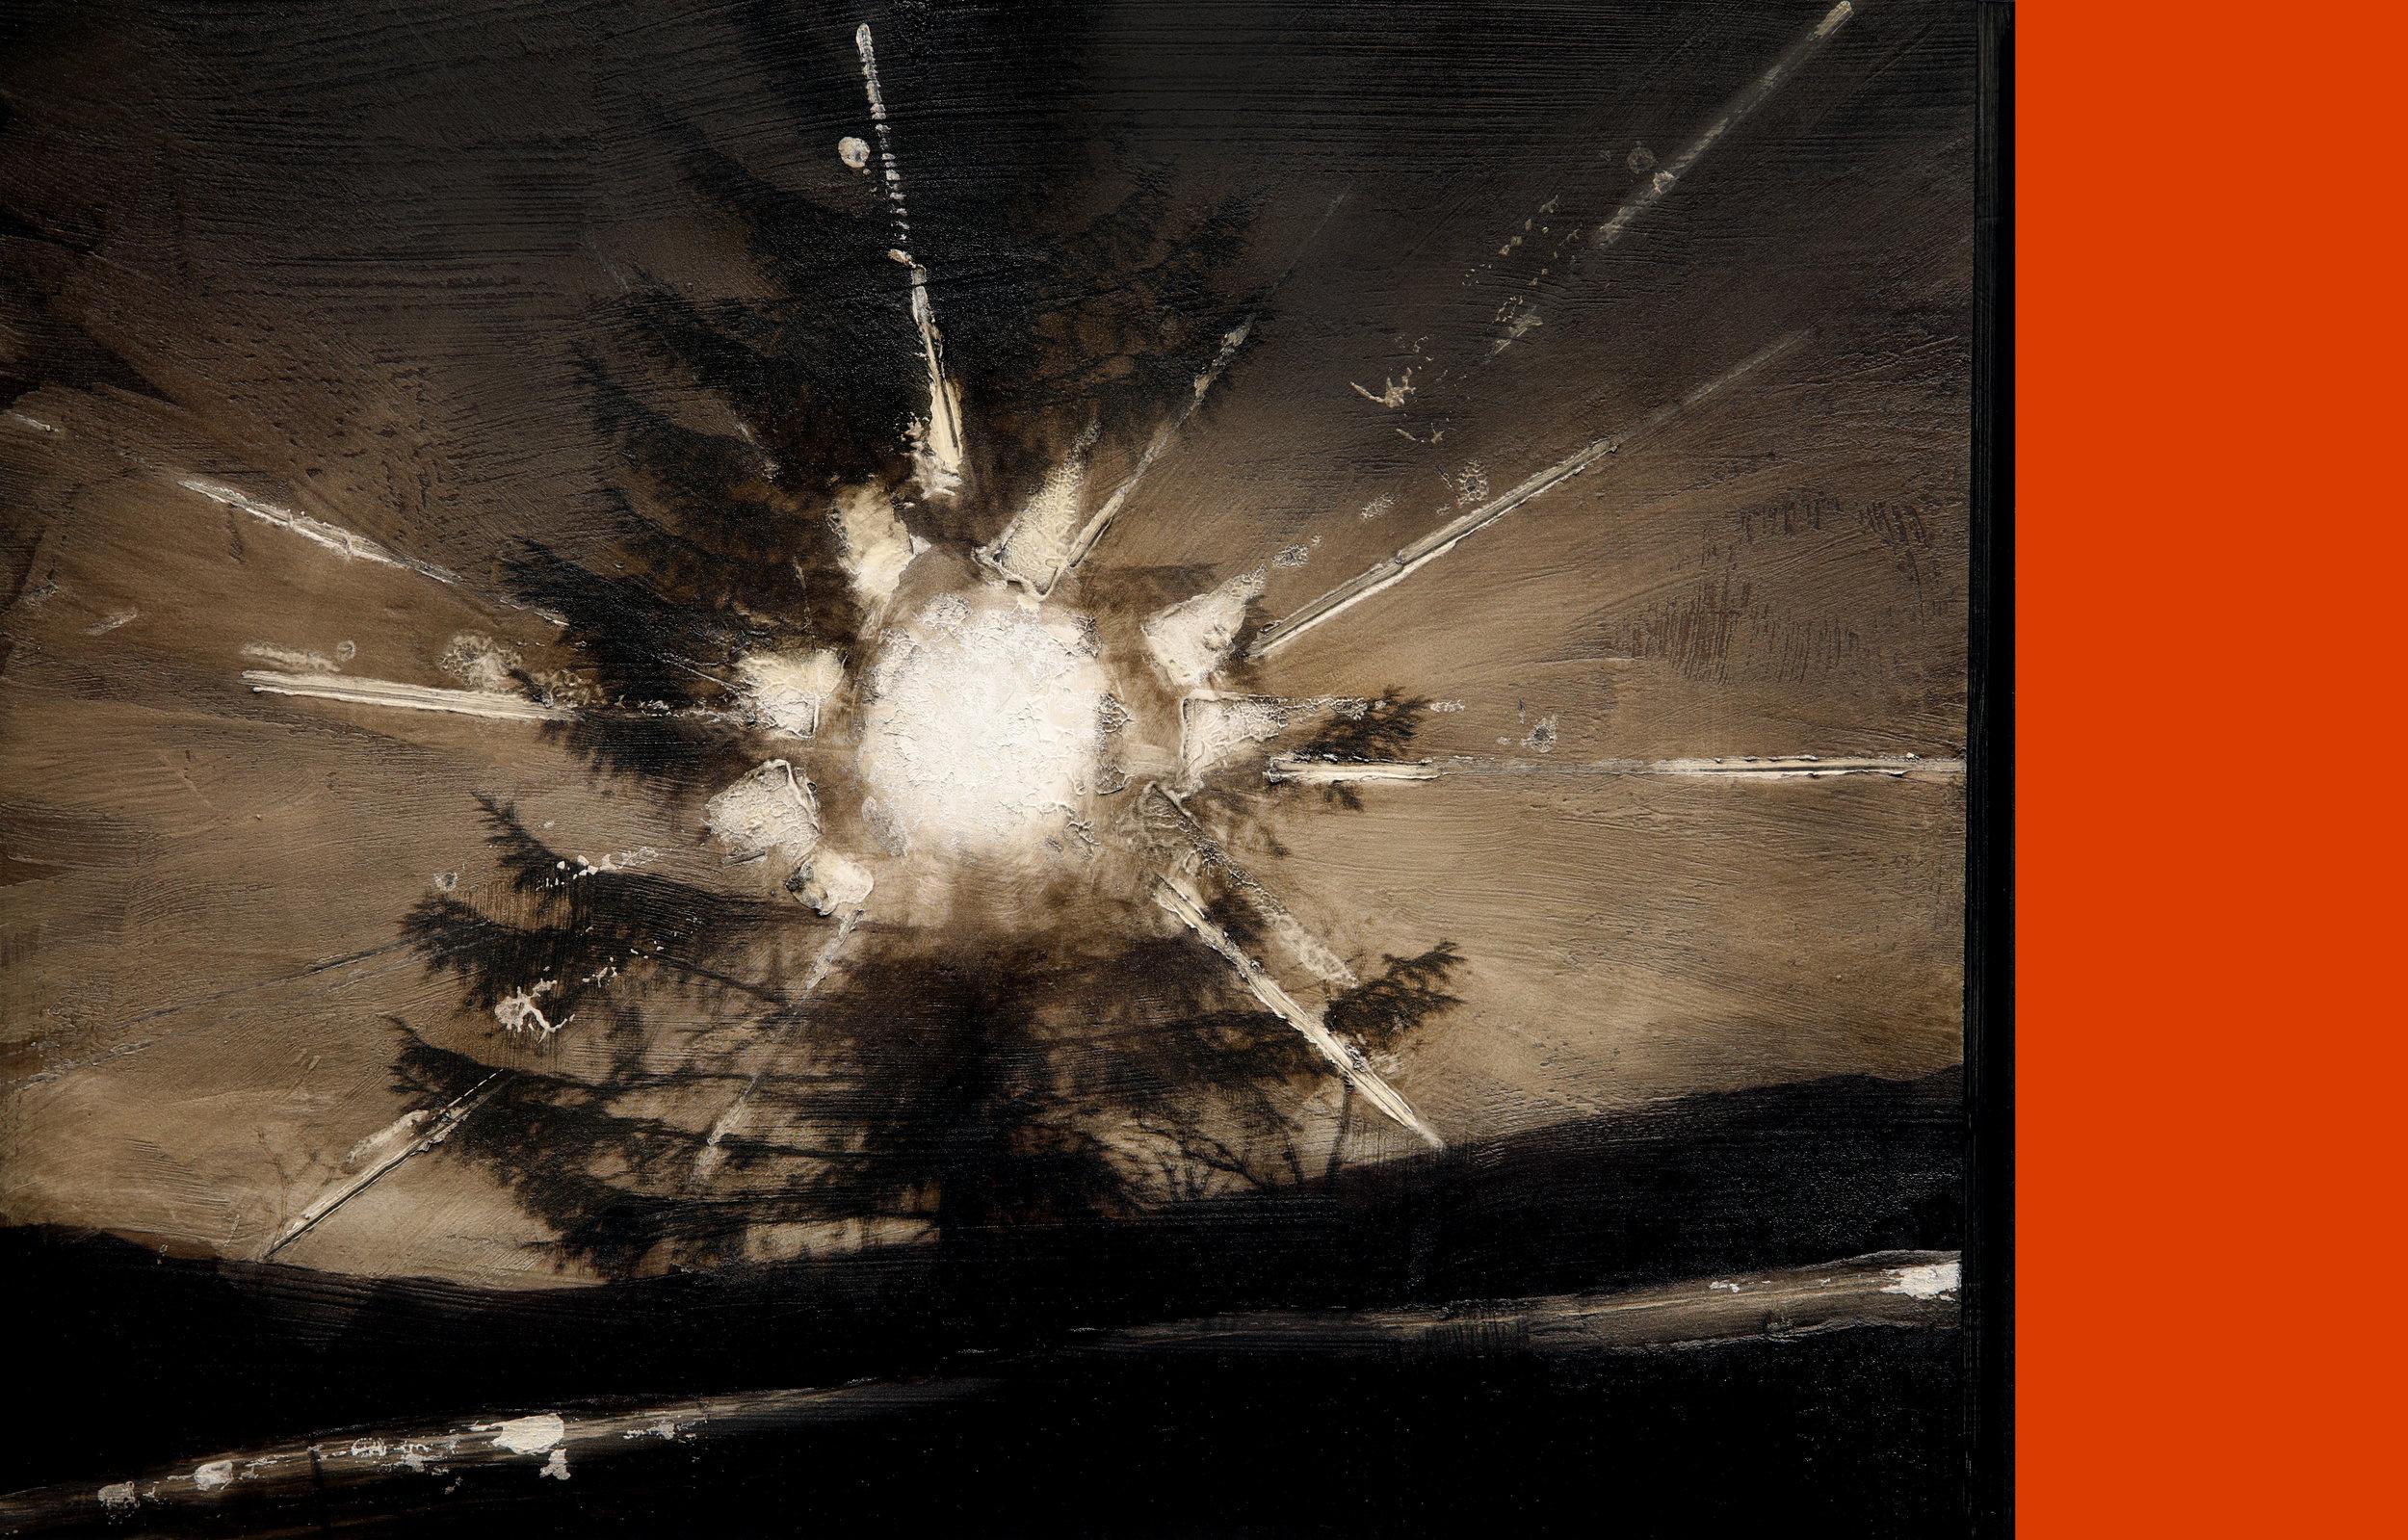 Monochrome / Reservoir / Fountain ( Setesdal)  Mixed Media / Oil on Canvas 60 x 40 cm / 24 x 16 in Courtesy: Hamar Sagbladsfabrikk